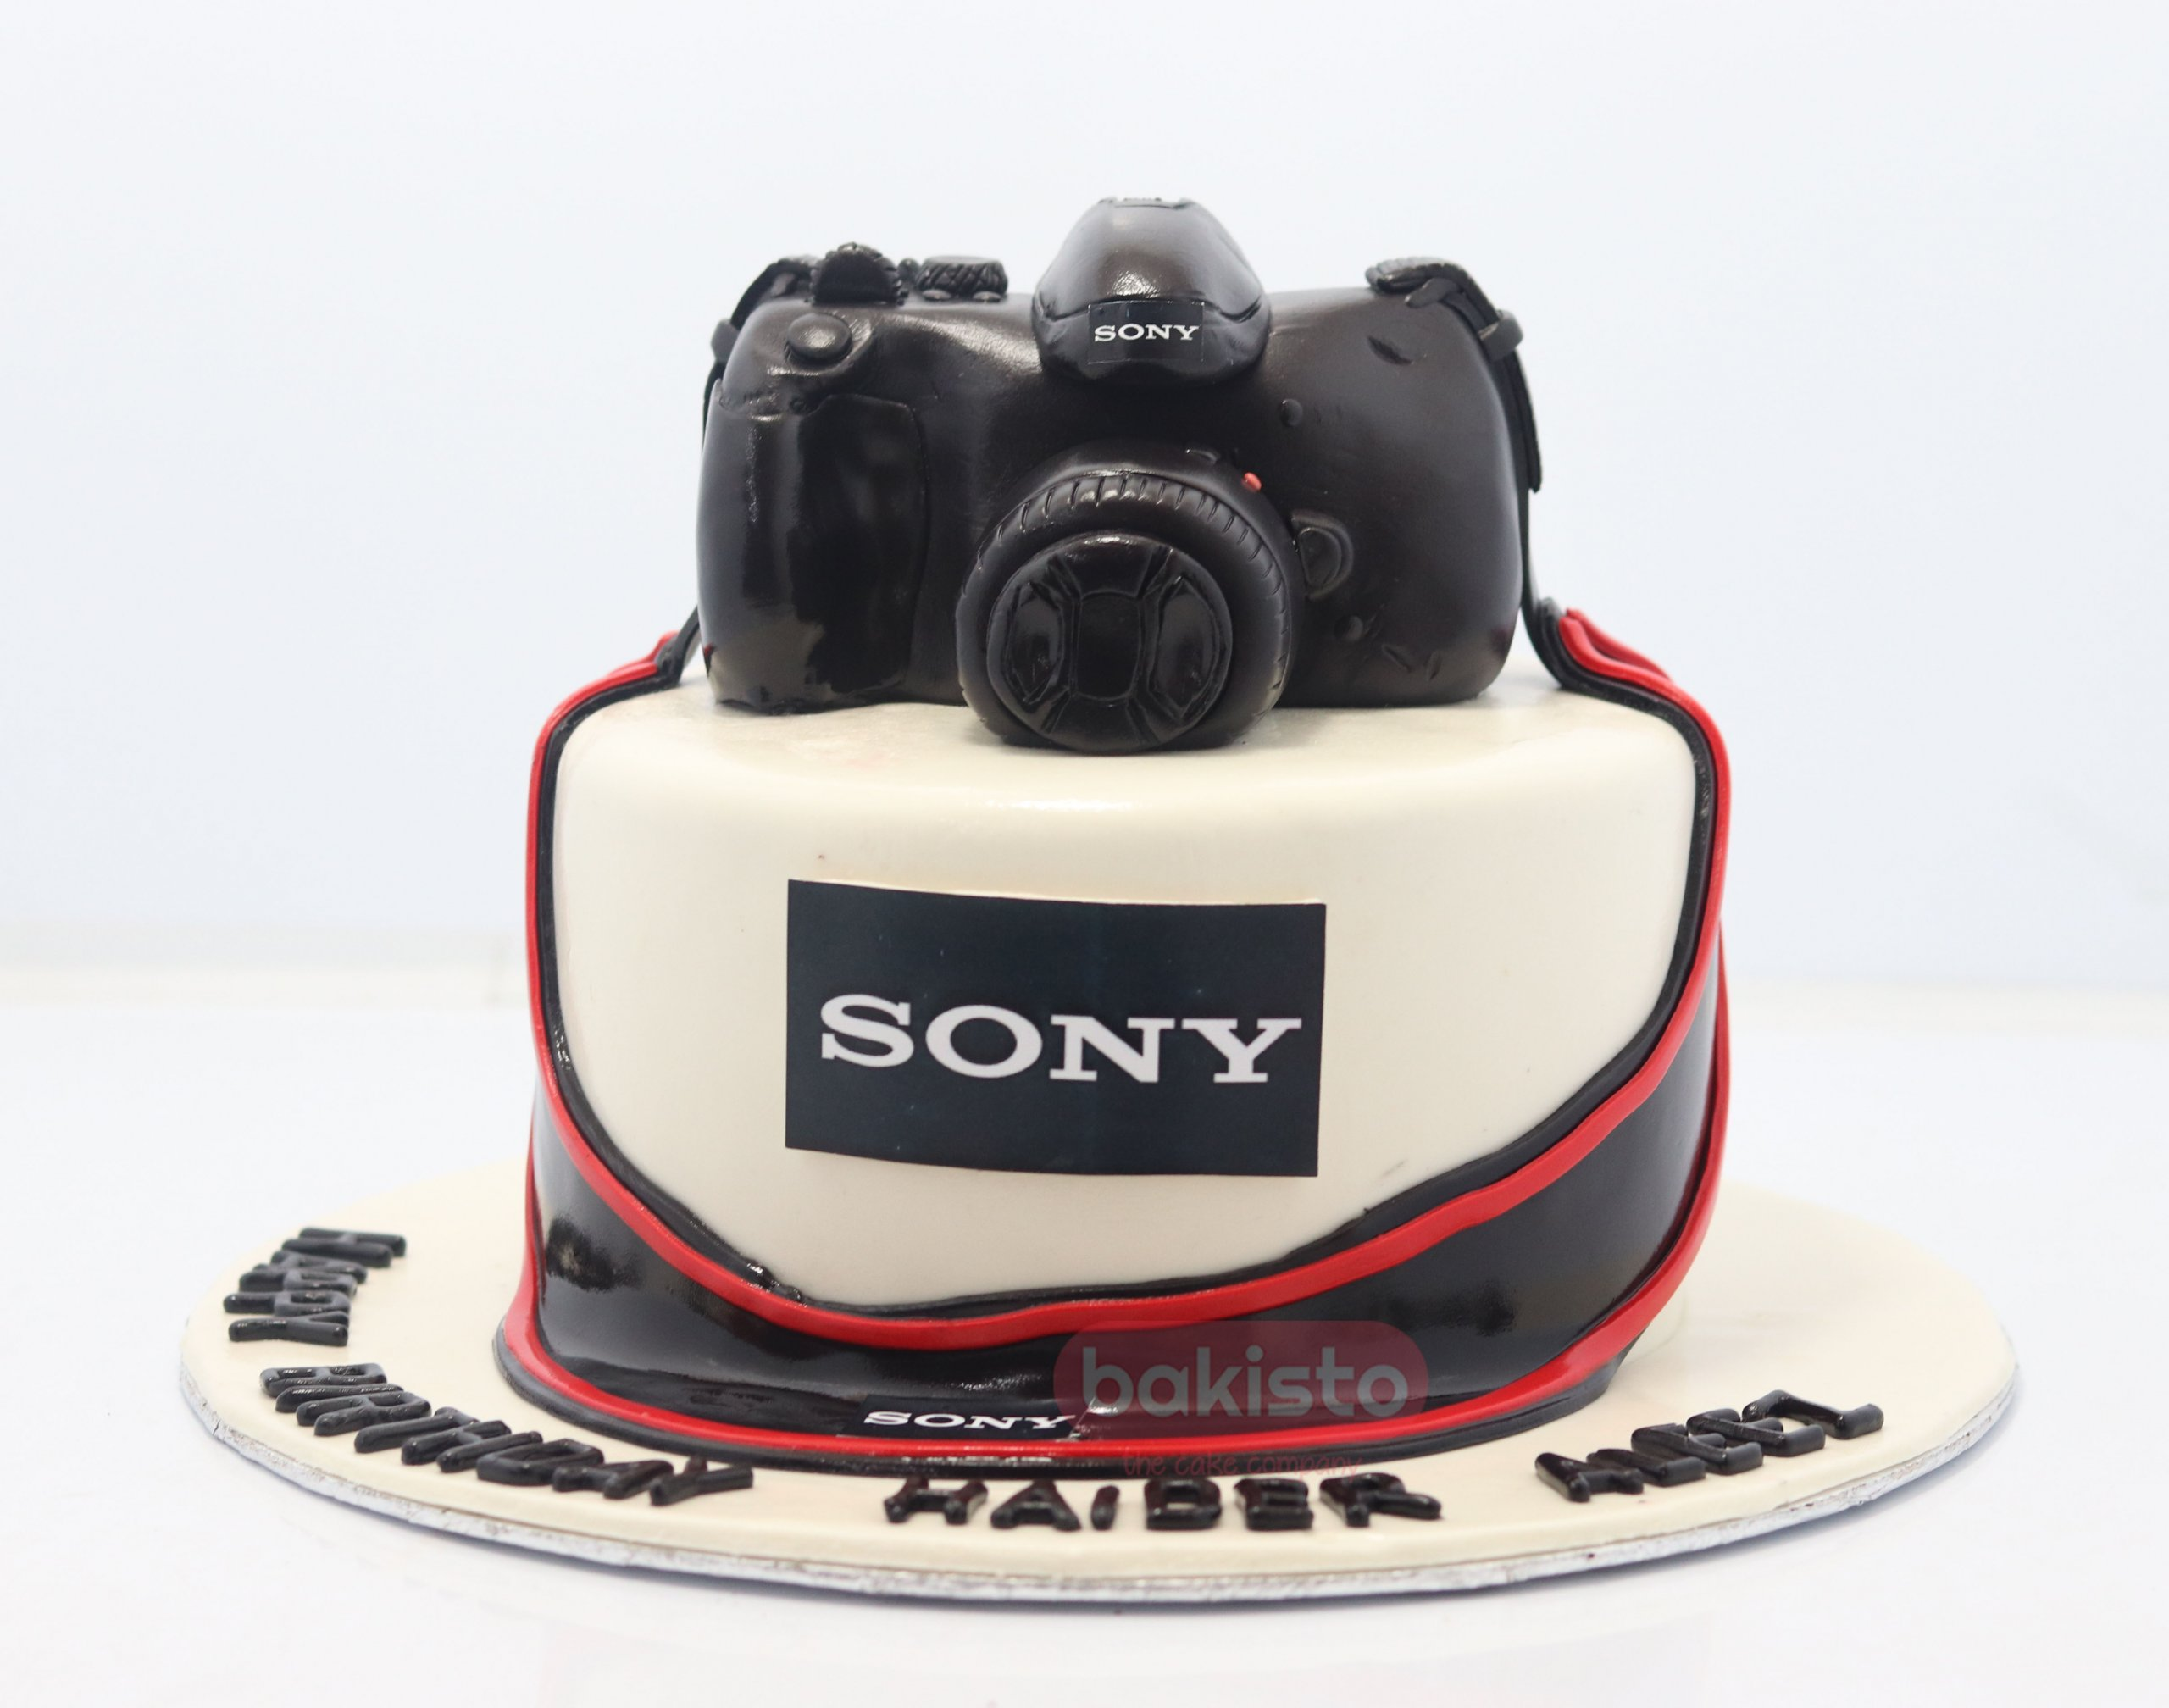 Surprising Customized Camera Cake By Bakisto The Cake Company With Logo Funny Birthday Cards Online Benoljebrpdamsfinfo